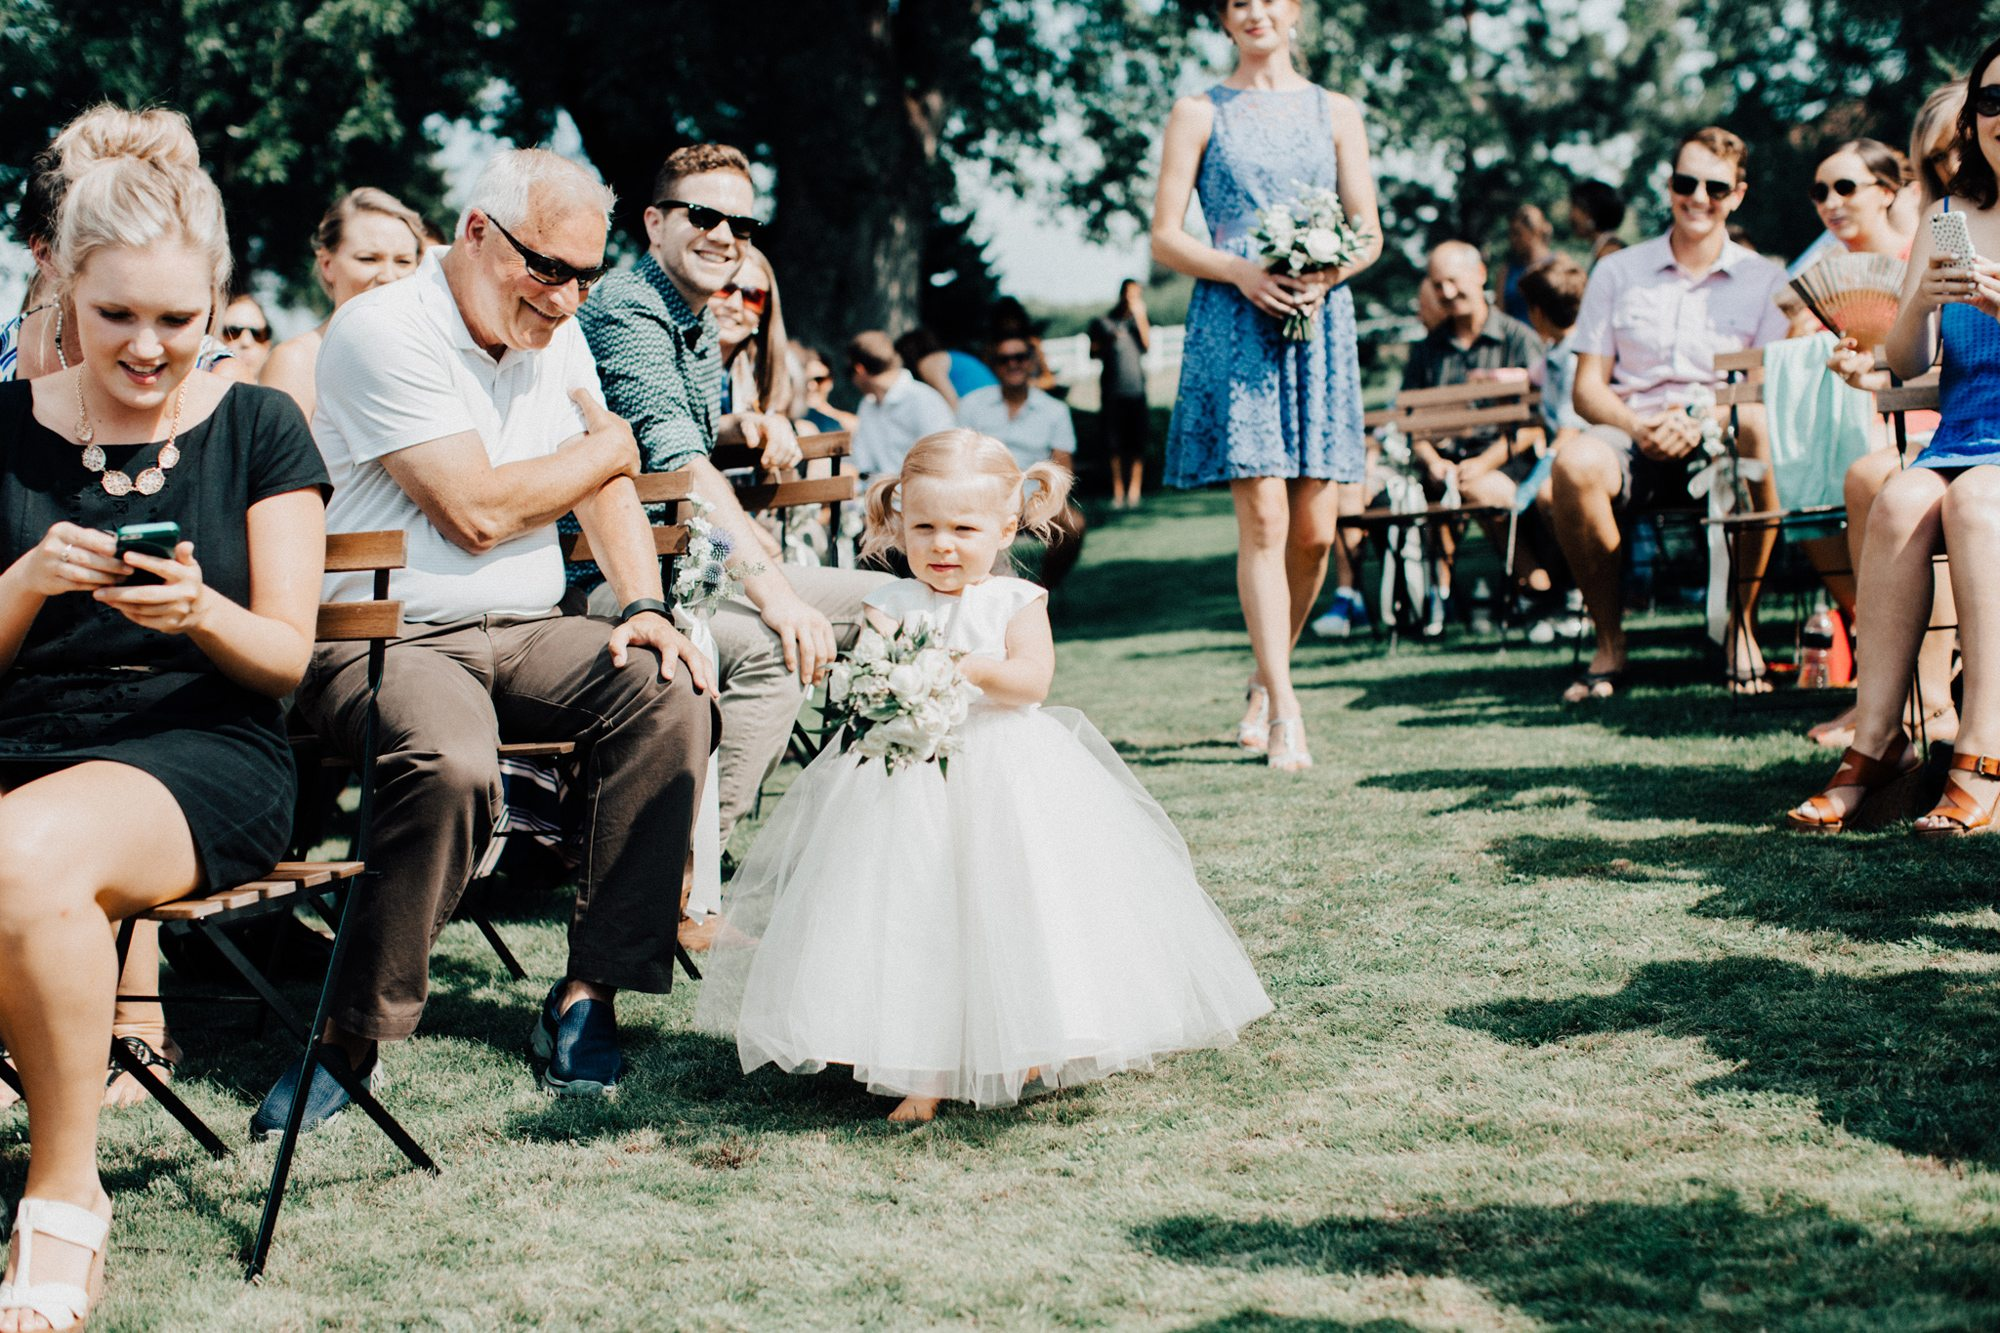 247-kelowna-wedding-photographer